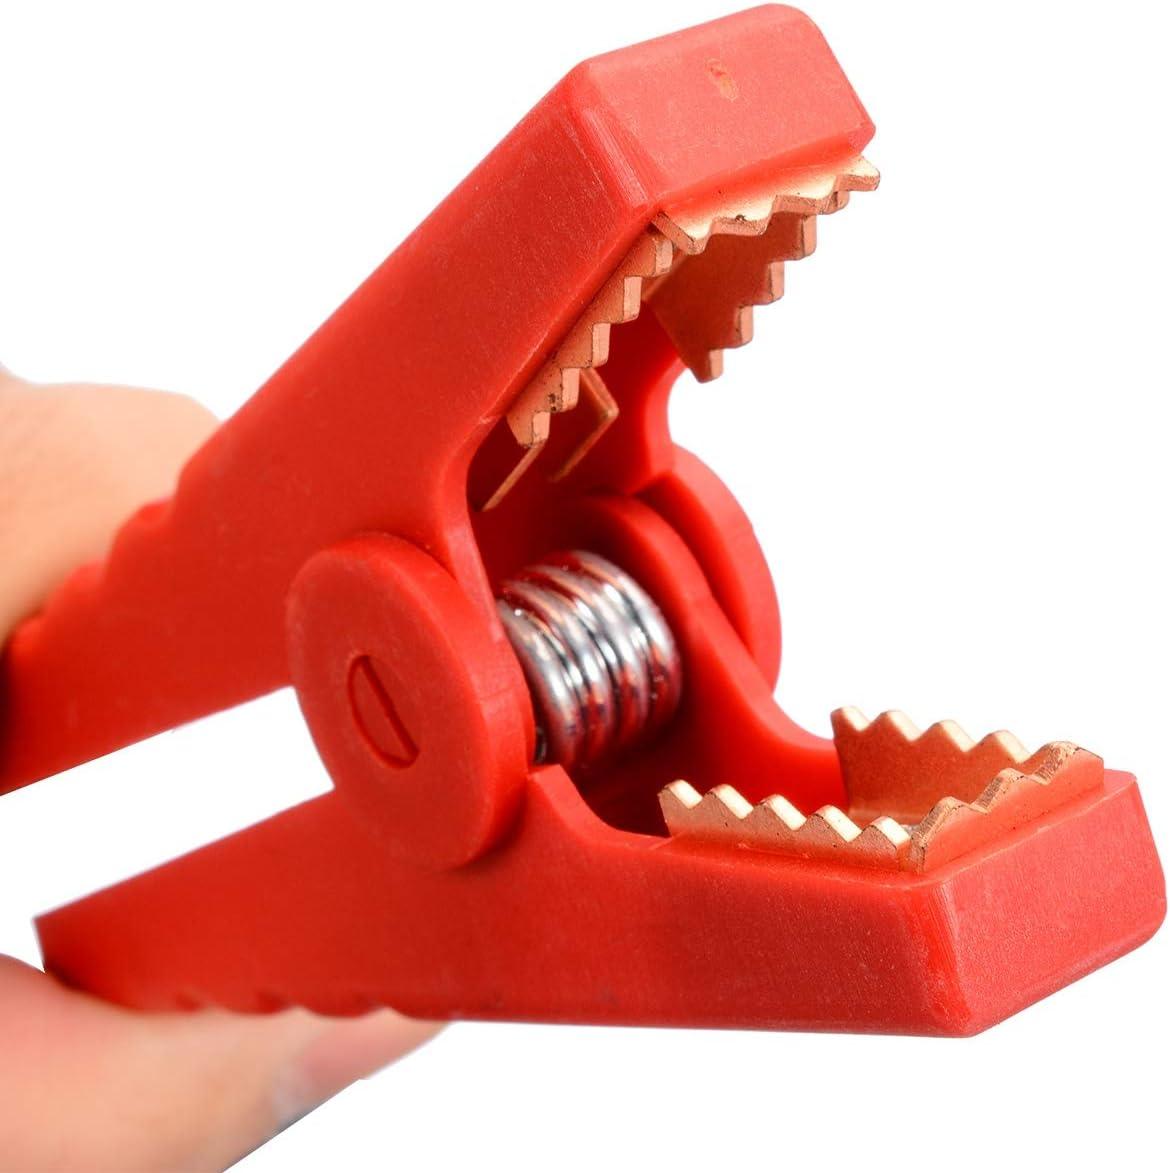 Without brand SY-EYUJ Size : 95mm 2ST Krokodil Abgreifklemme Ganz isoliert 100A Autobatterie Alligator Pr/üfklemmen Clips for Batterieladeger/äte